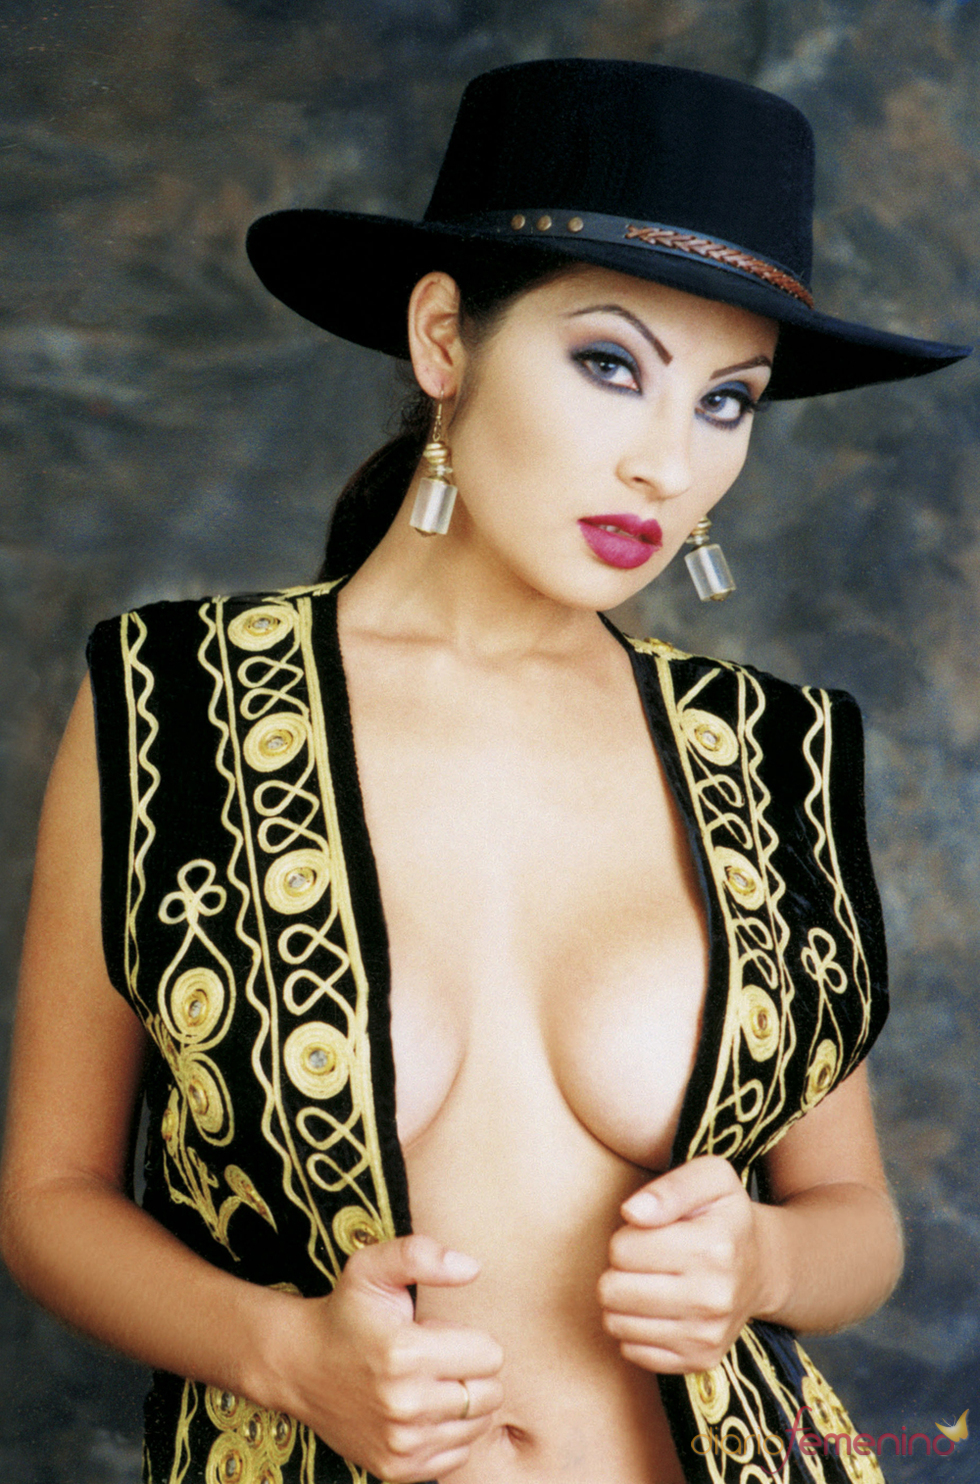 La belleza de la narco modelo Angie Sanclemente Valencia